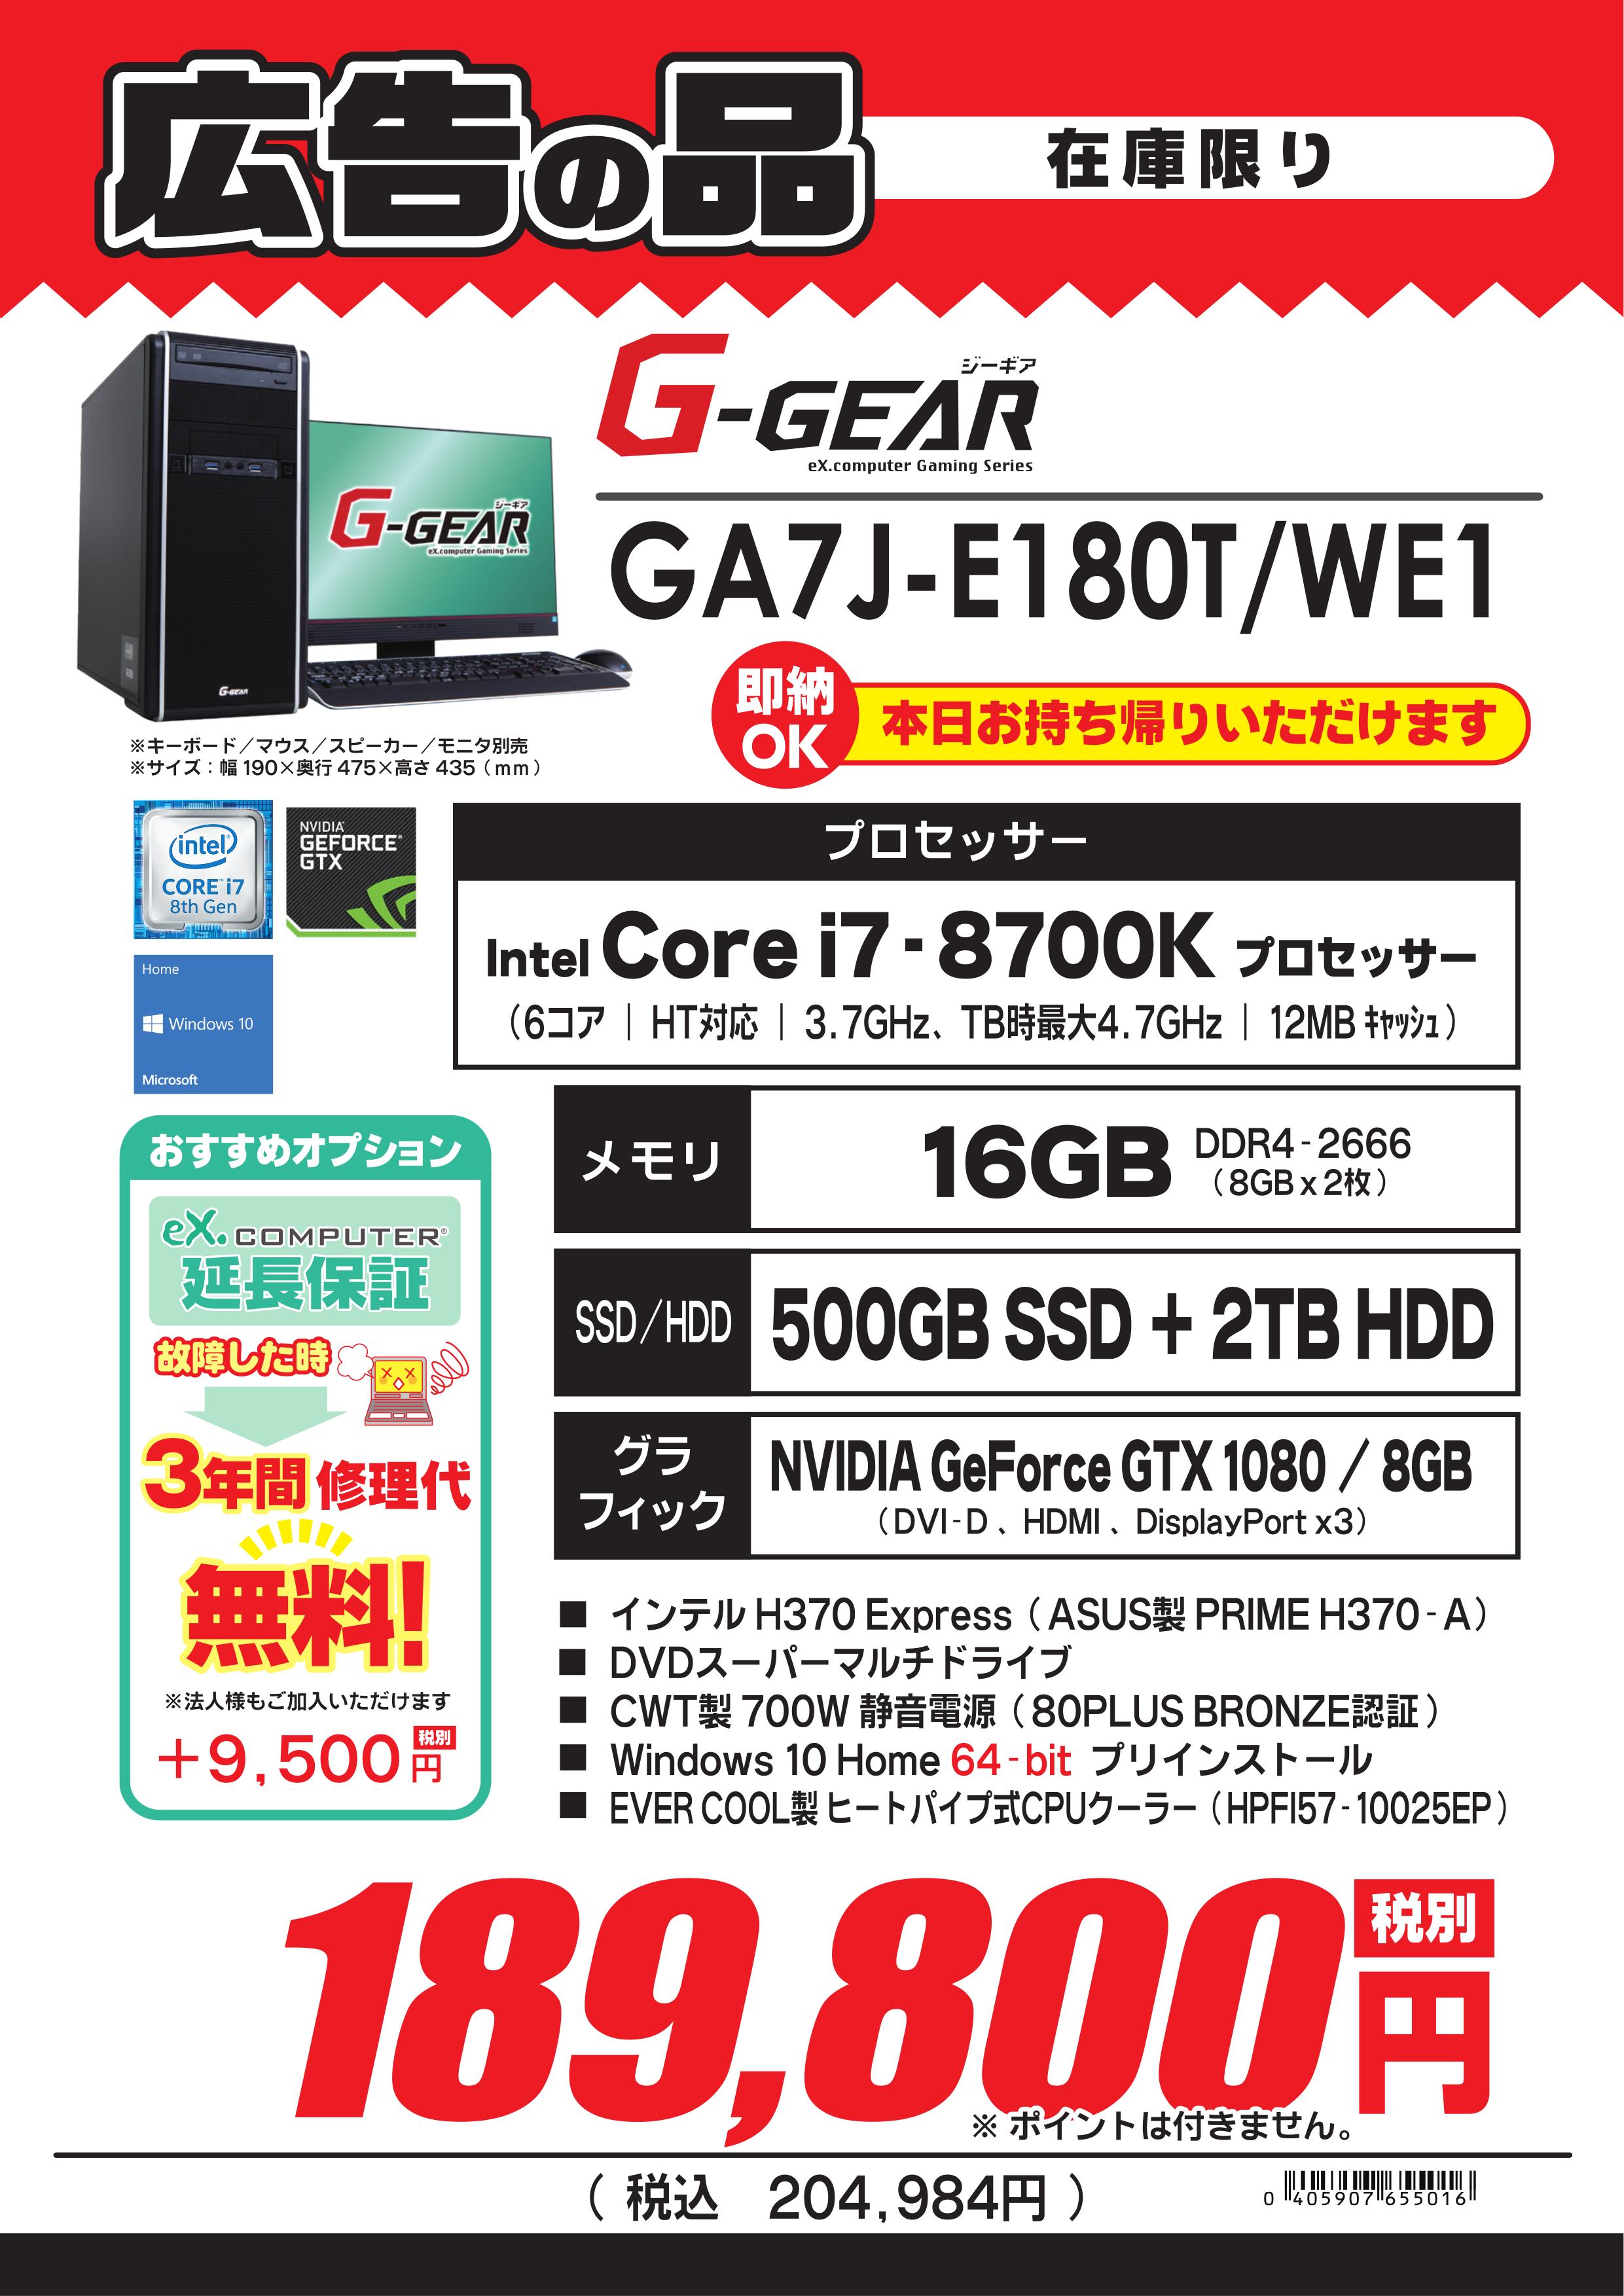 GA7J-E180T_WE1_imgs-0001.png